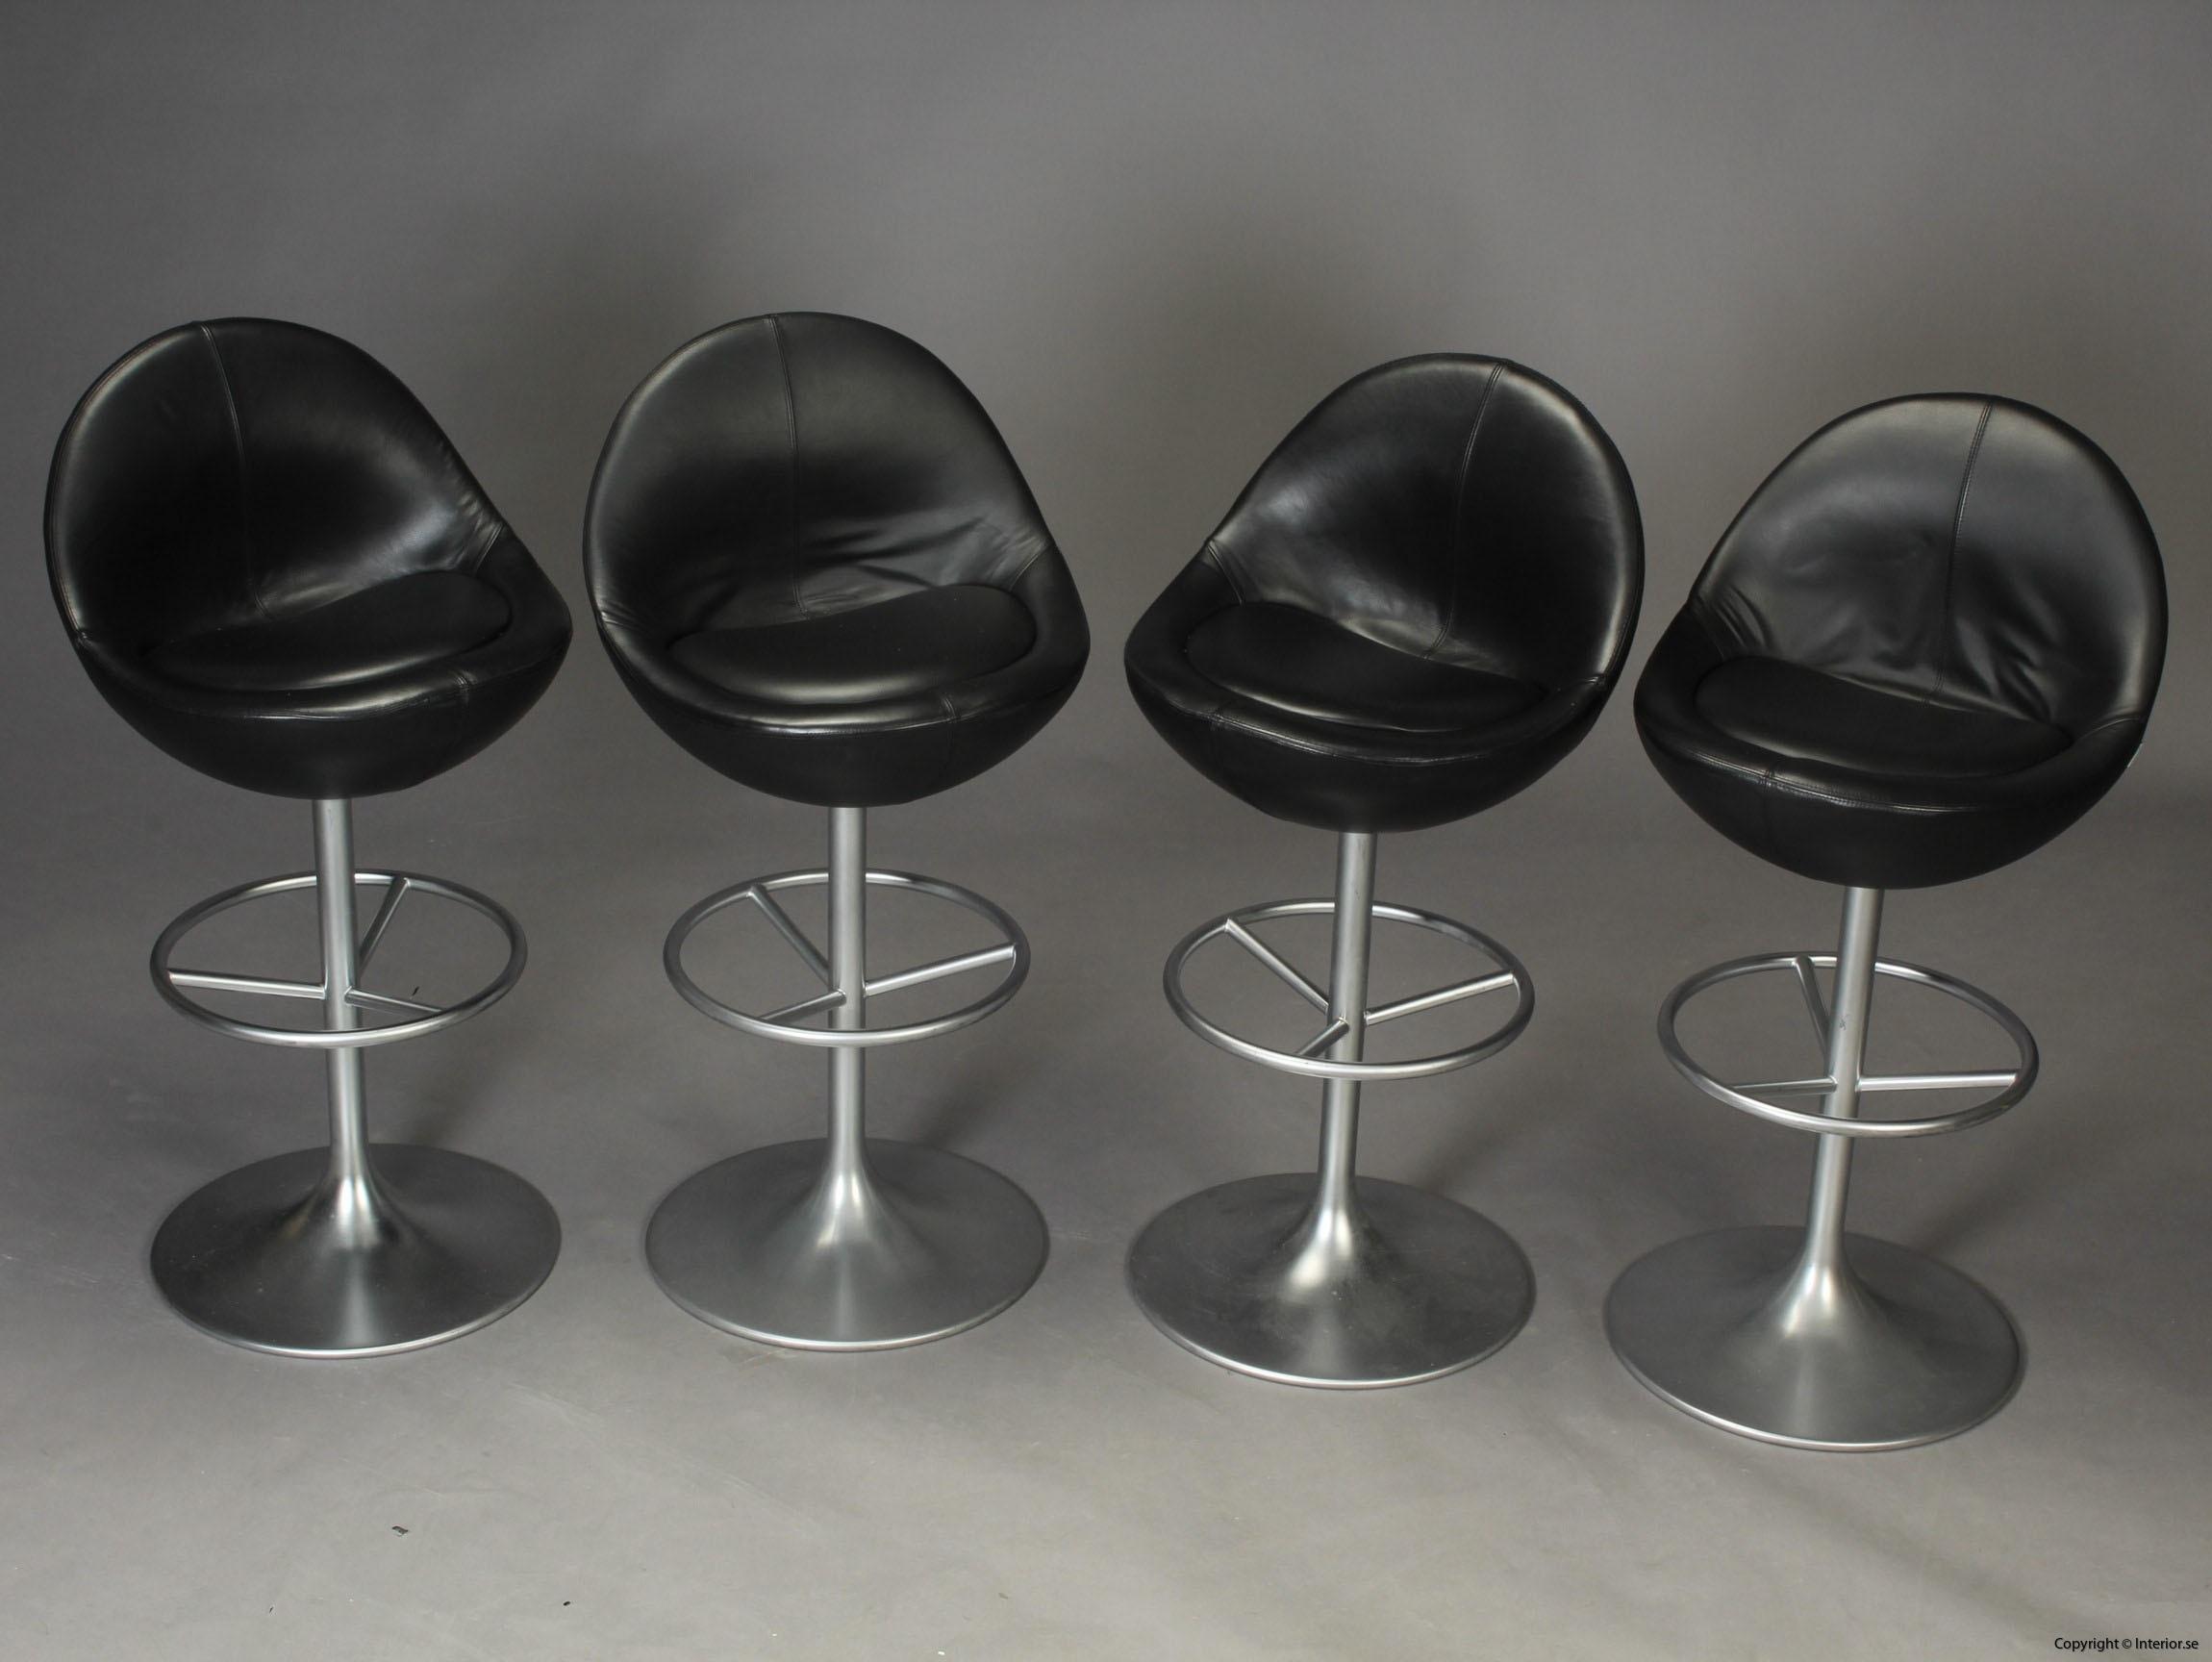 1 Johanson Design venus barstol (2)